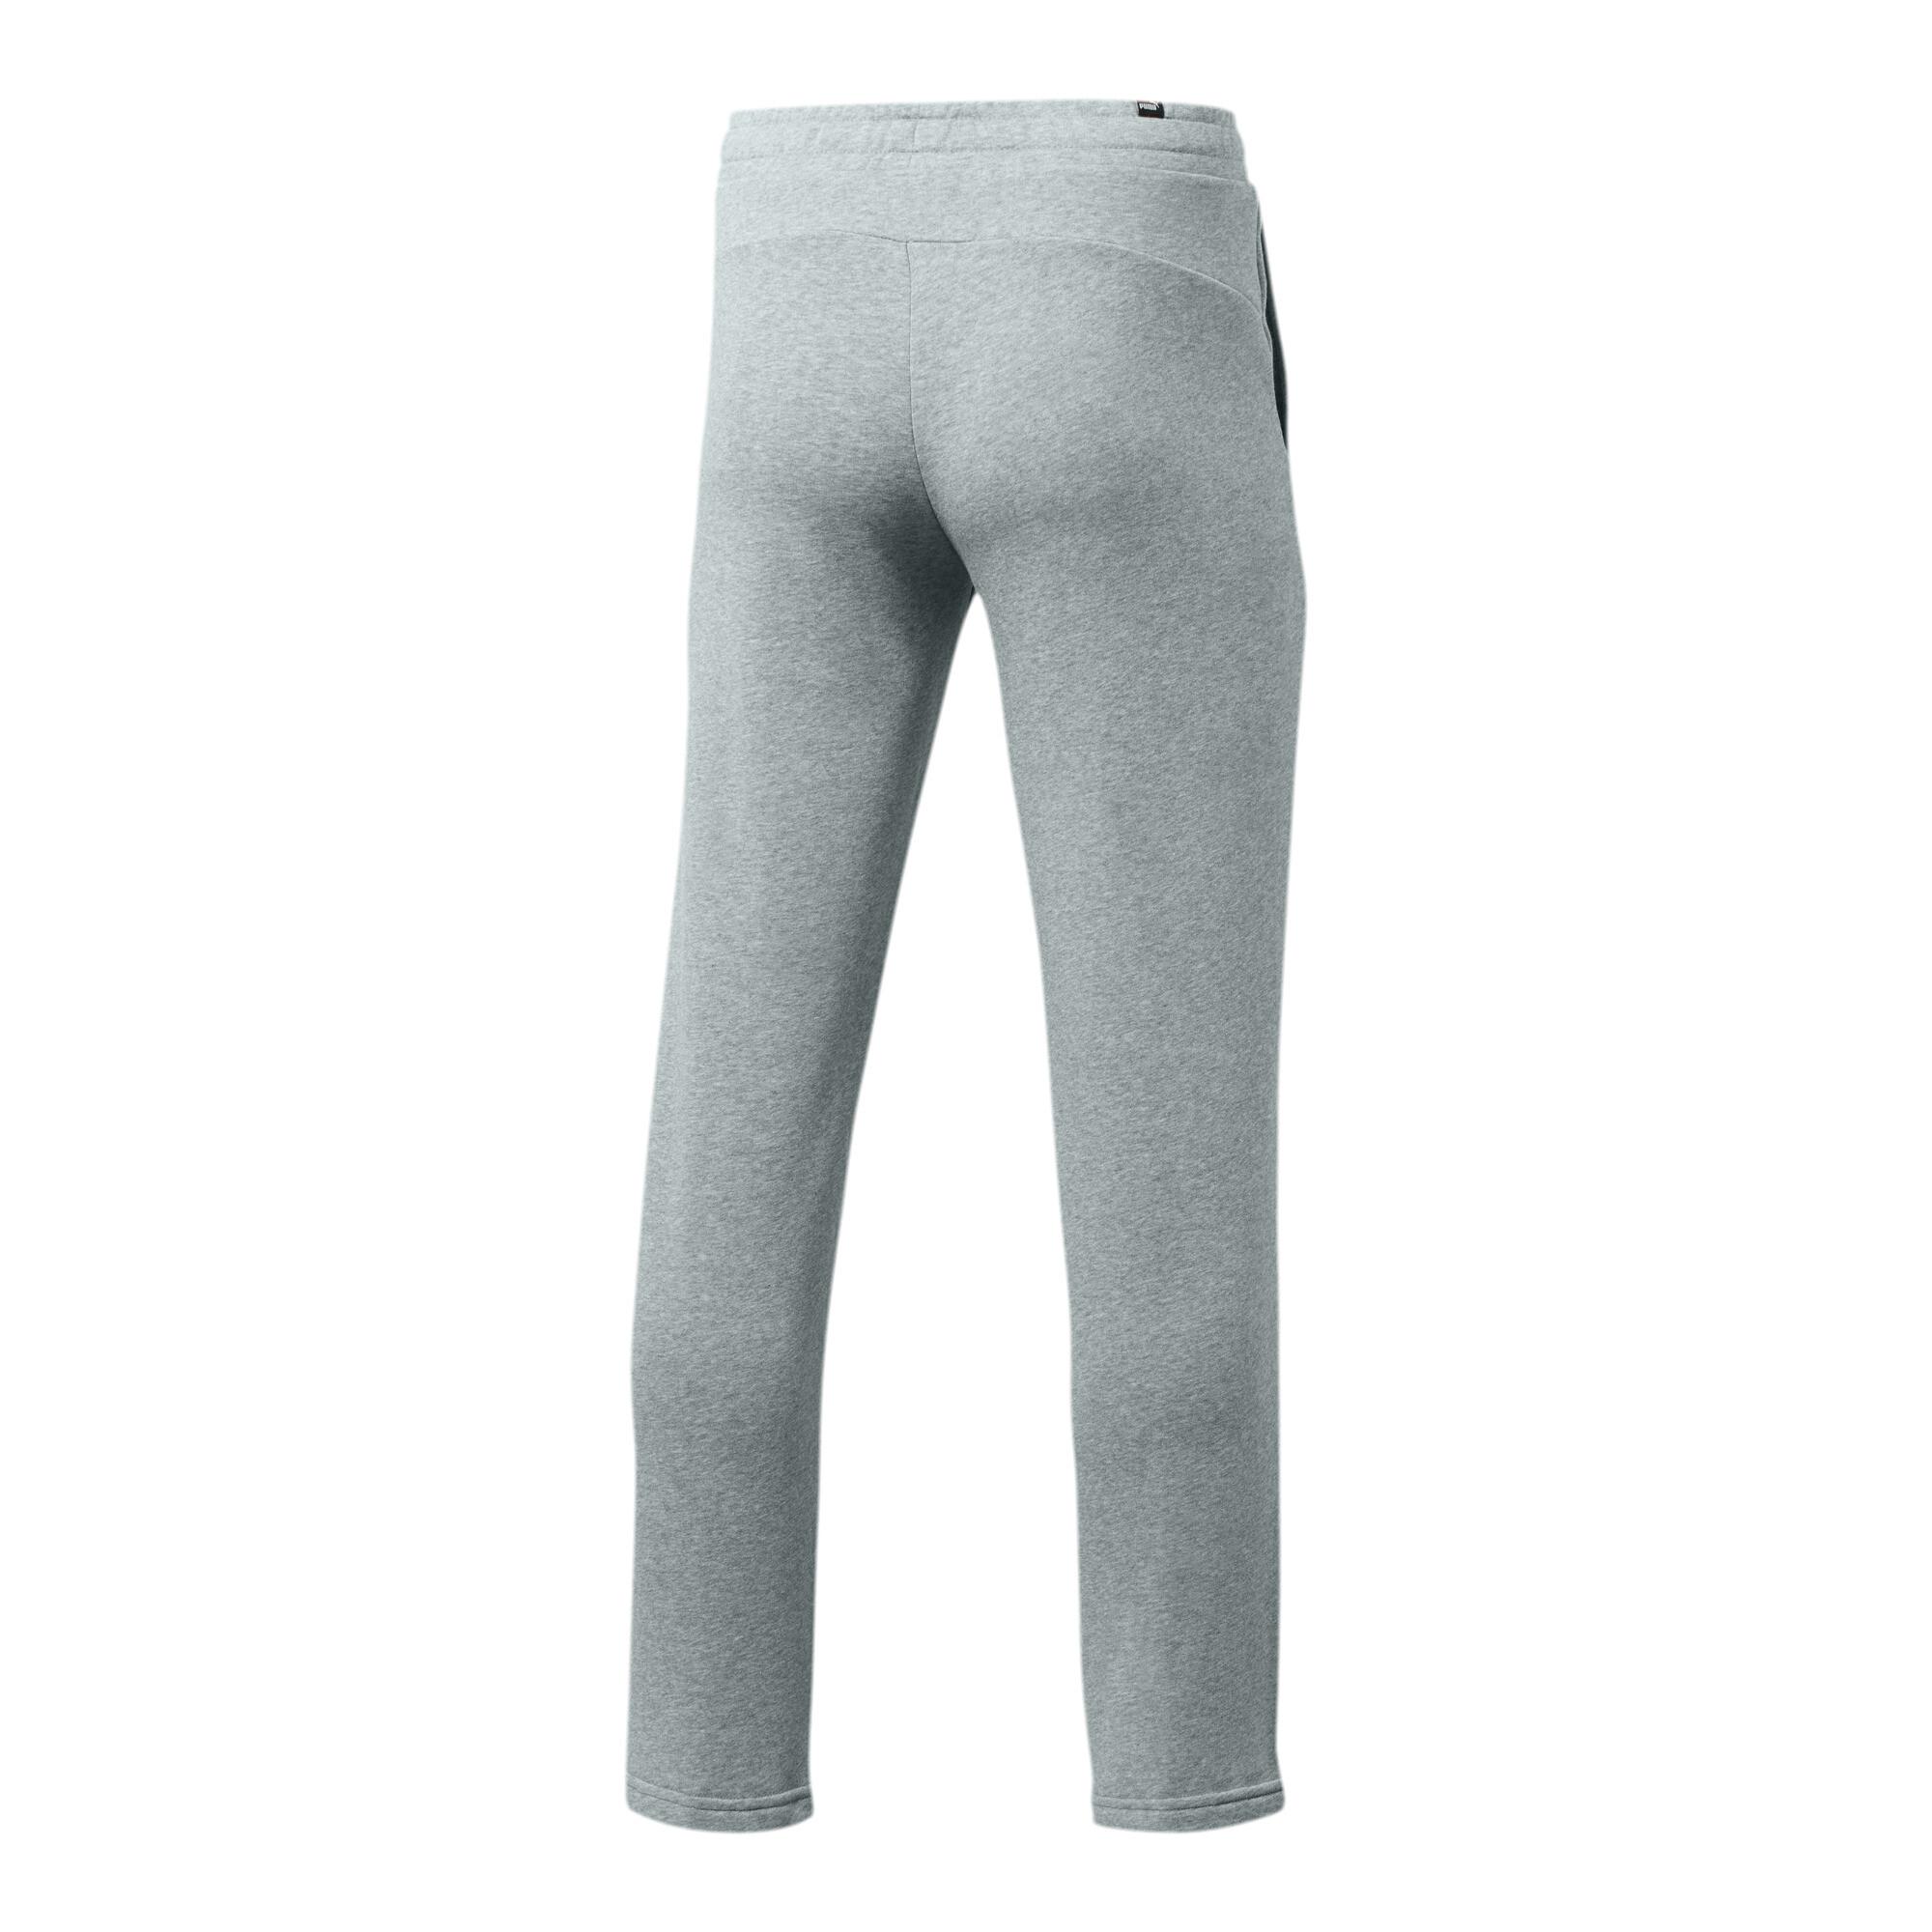 PUMA-Essentials-Men-039-s-Sweatpants-Men-Knitted-Pants-Basics thumbnail 8